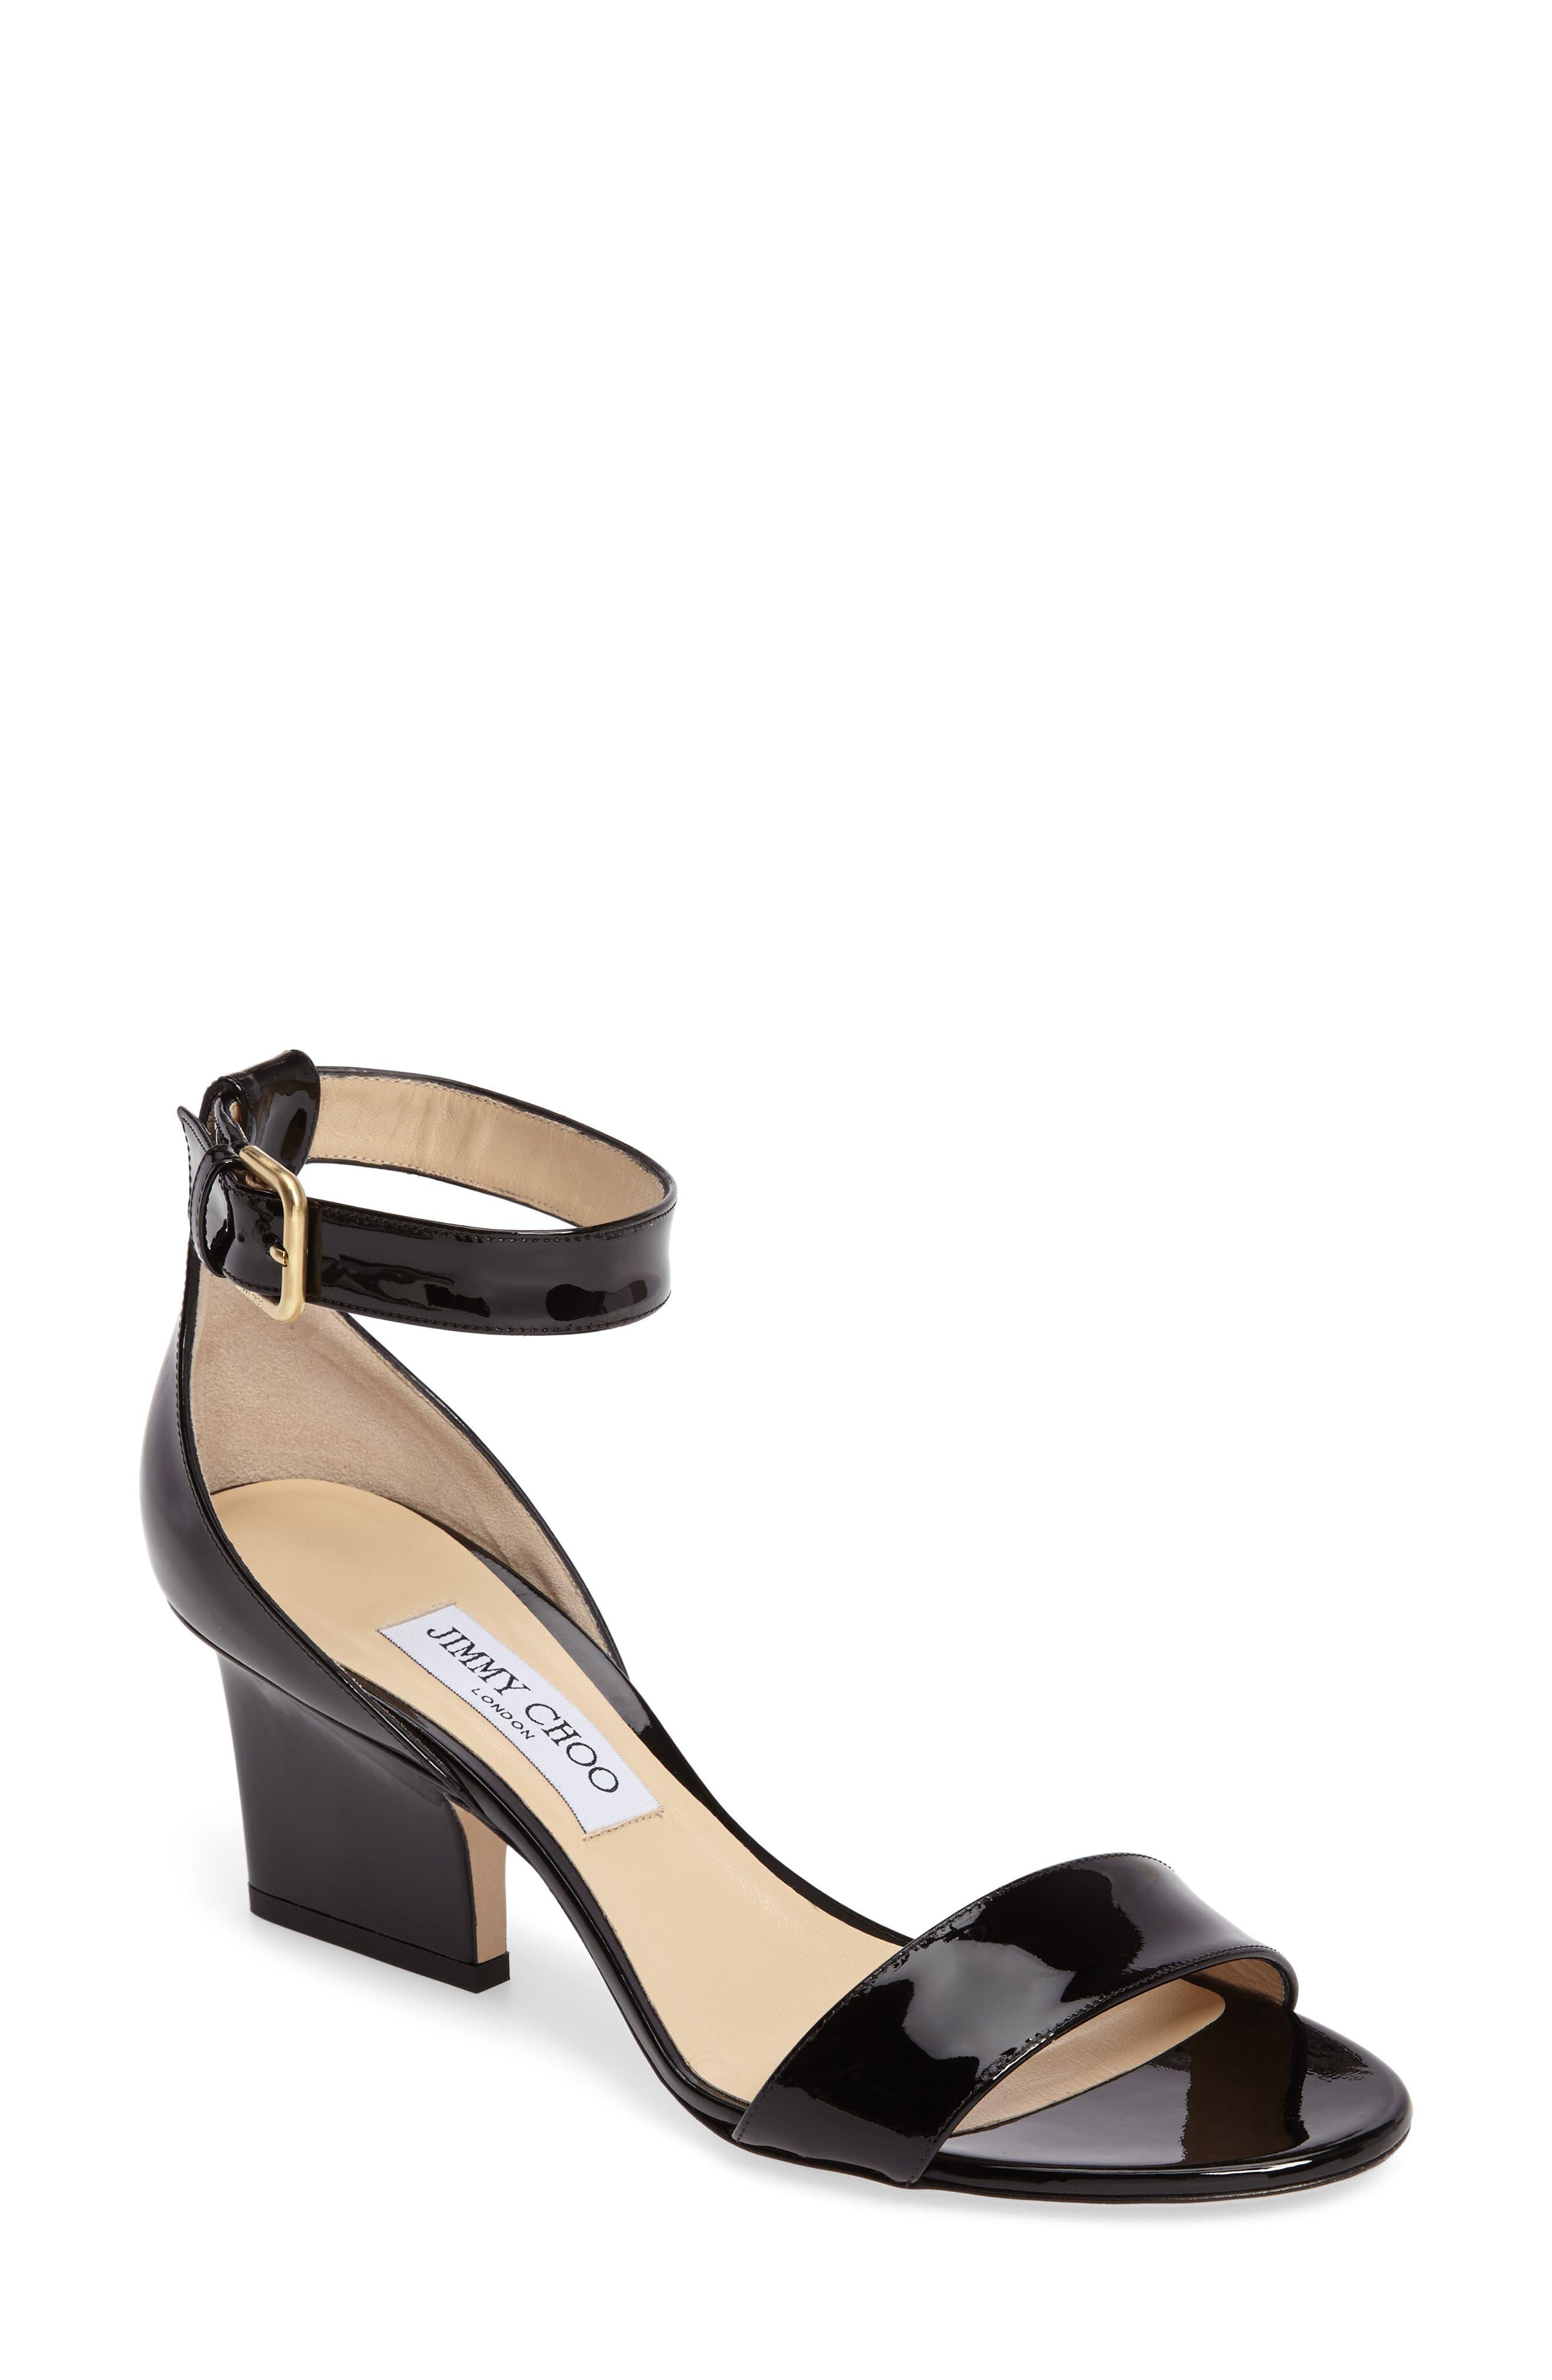 Sandals for Women On Sale, Black, Leather, 2017, 2.5 Jimmy Choo London